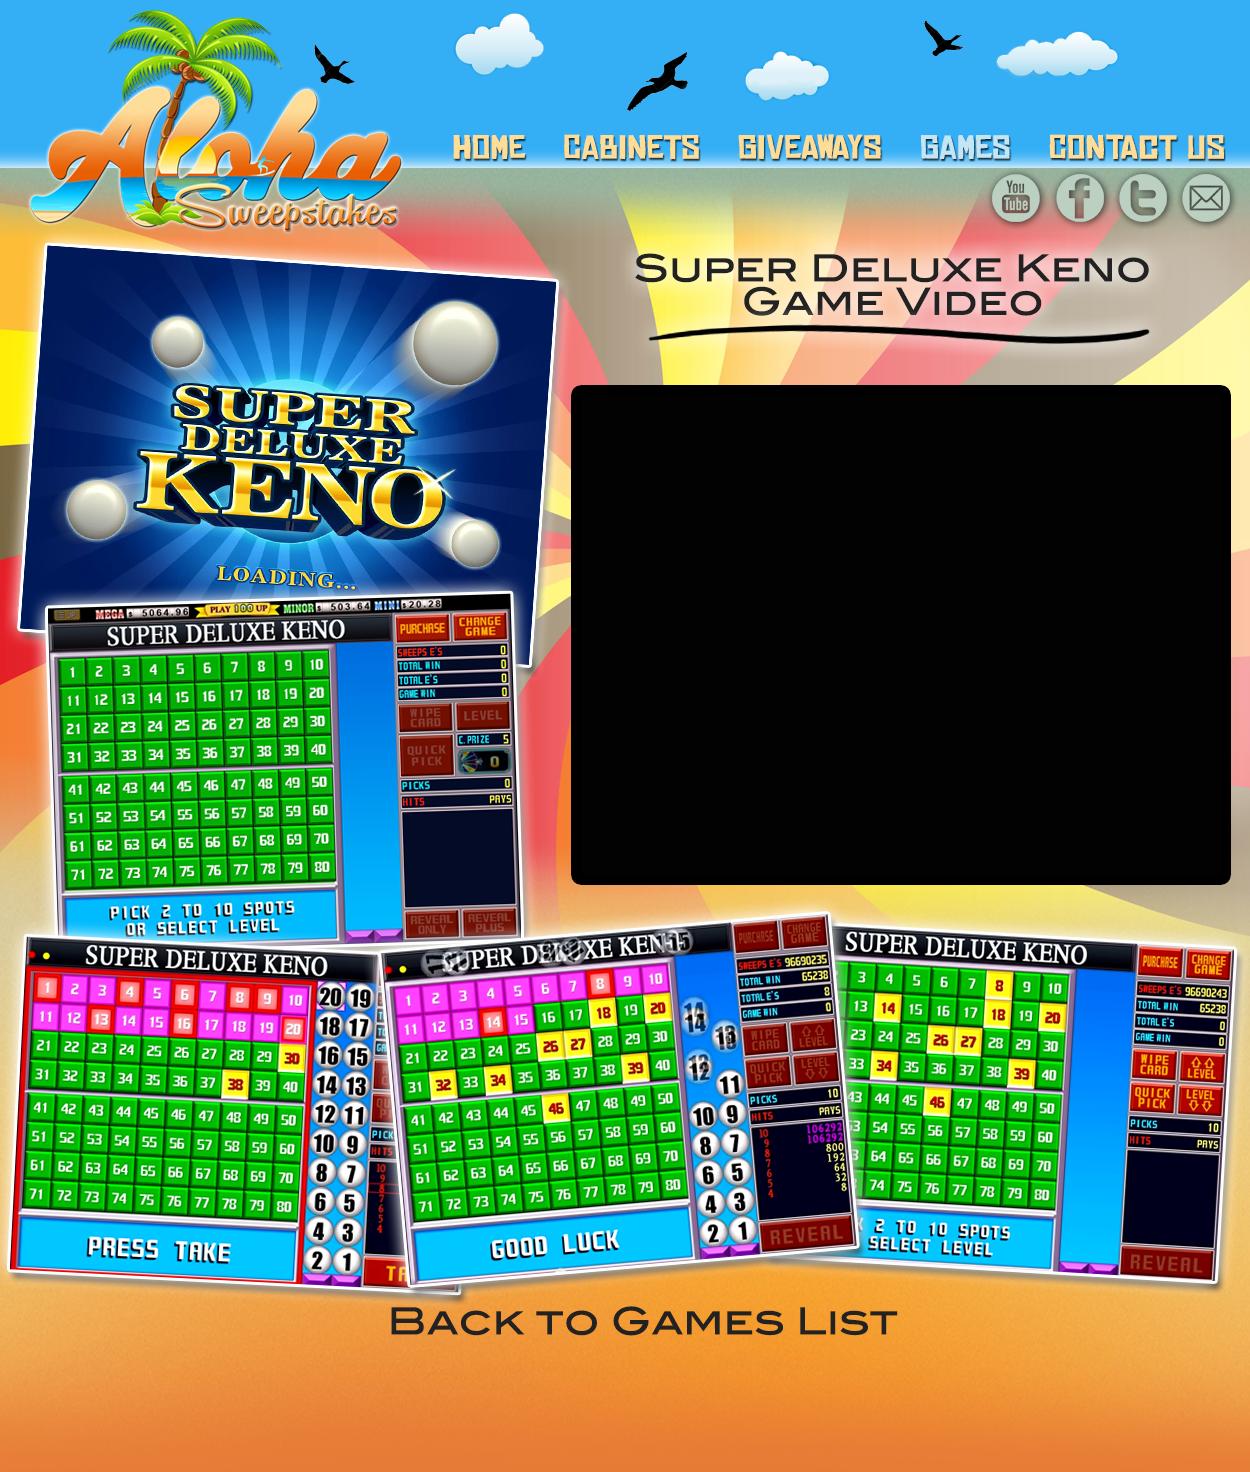 Aloha Sweepstakes Games Videos - Super Deluxe Keno